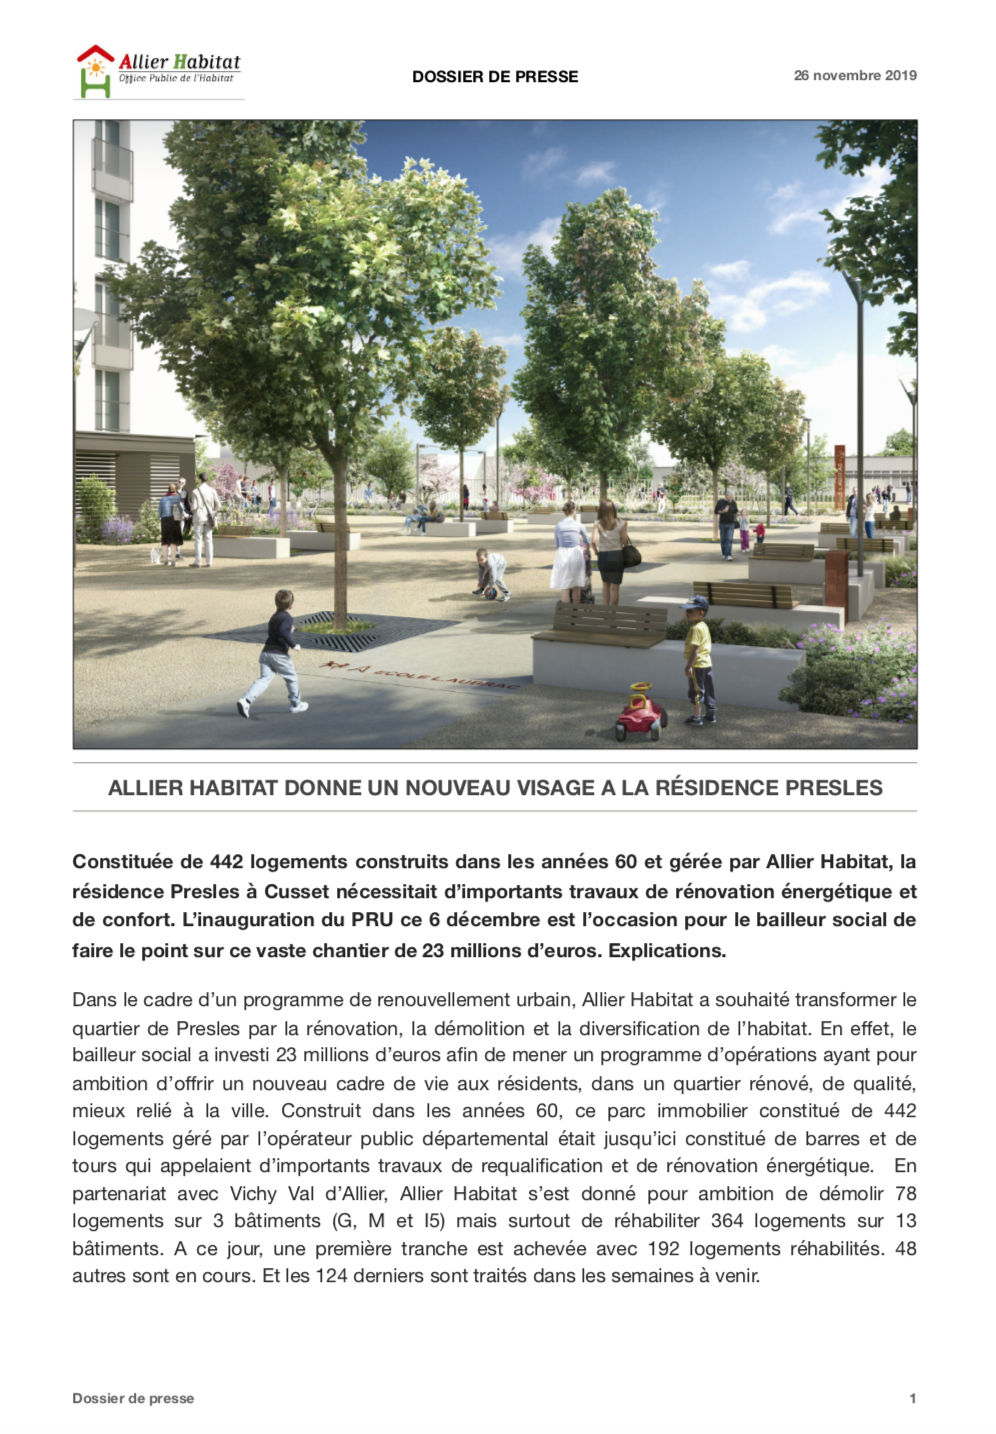 Dossier de presse Allier Habitat